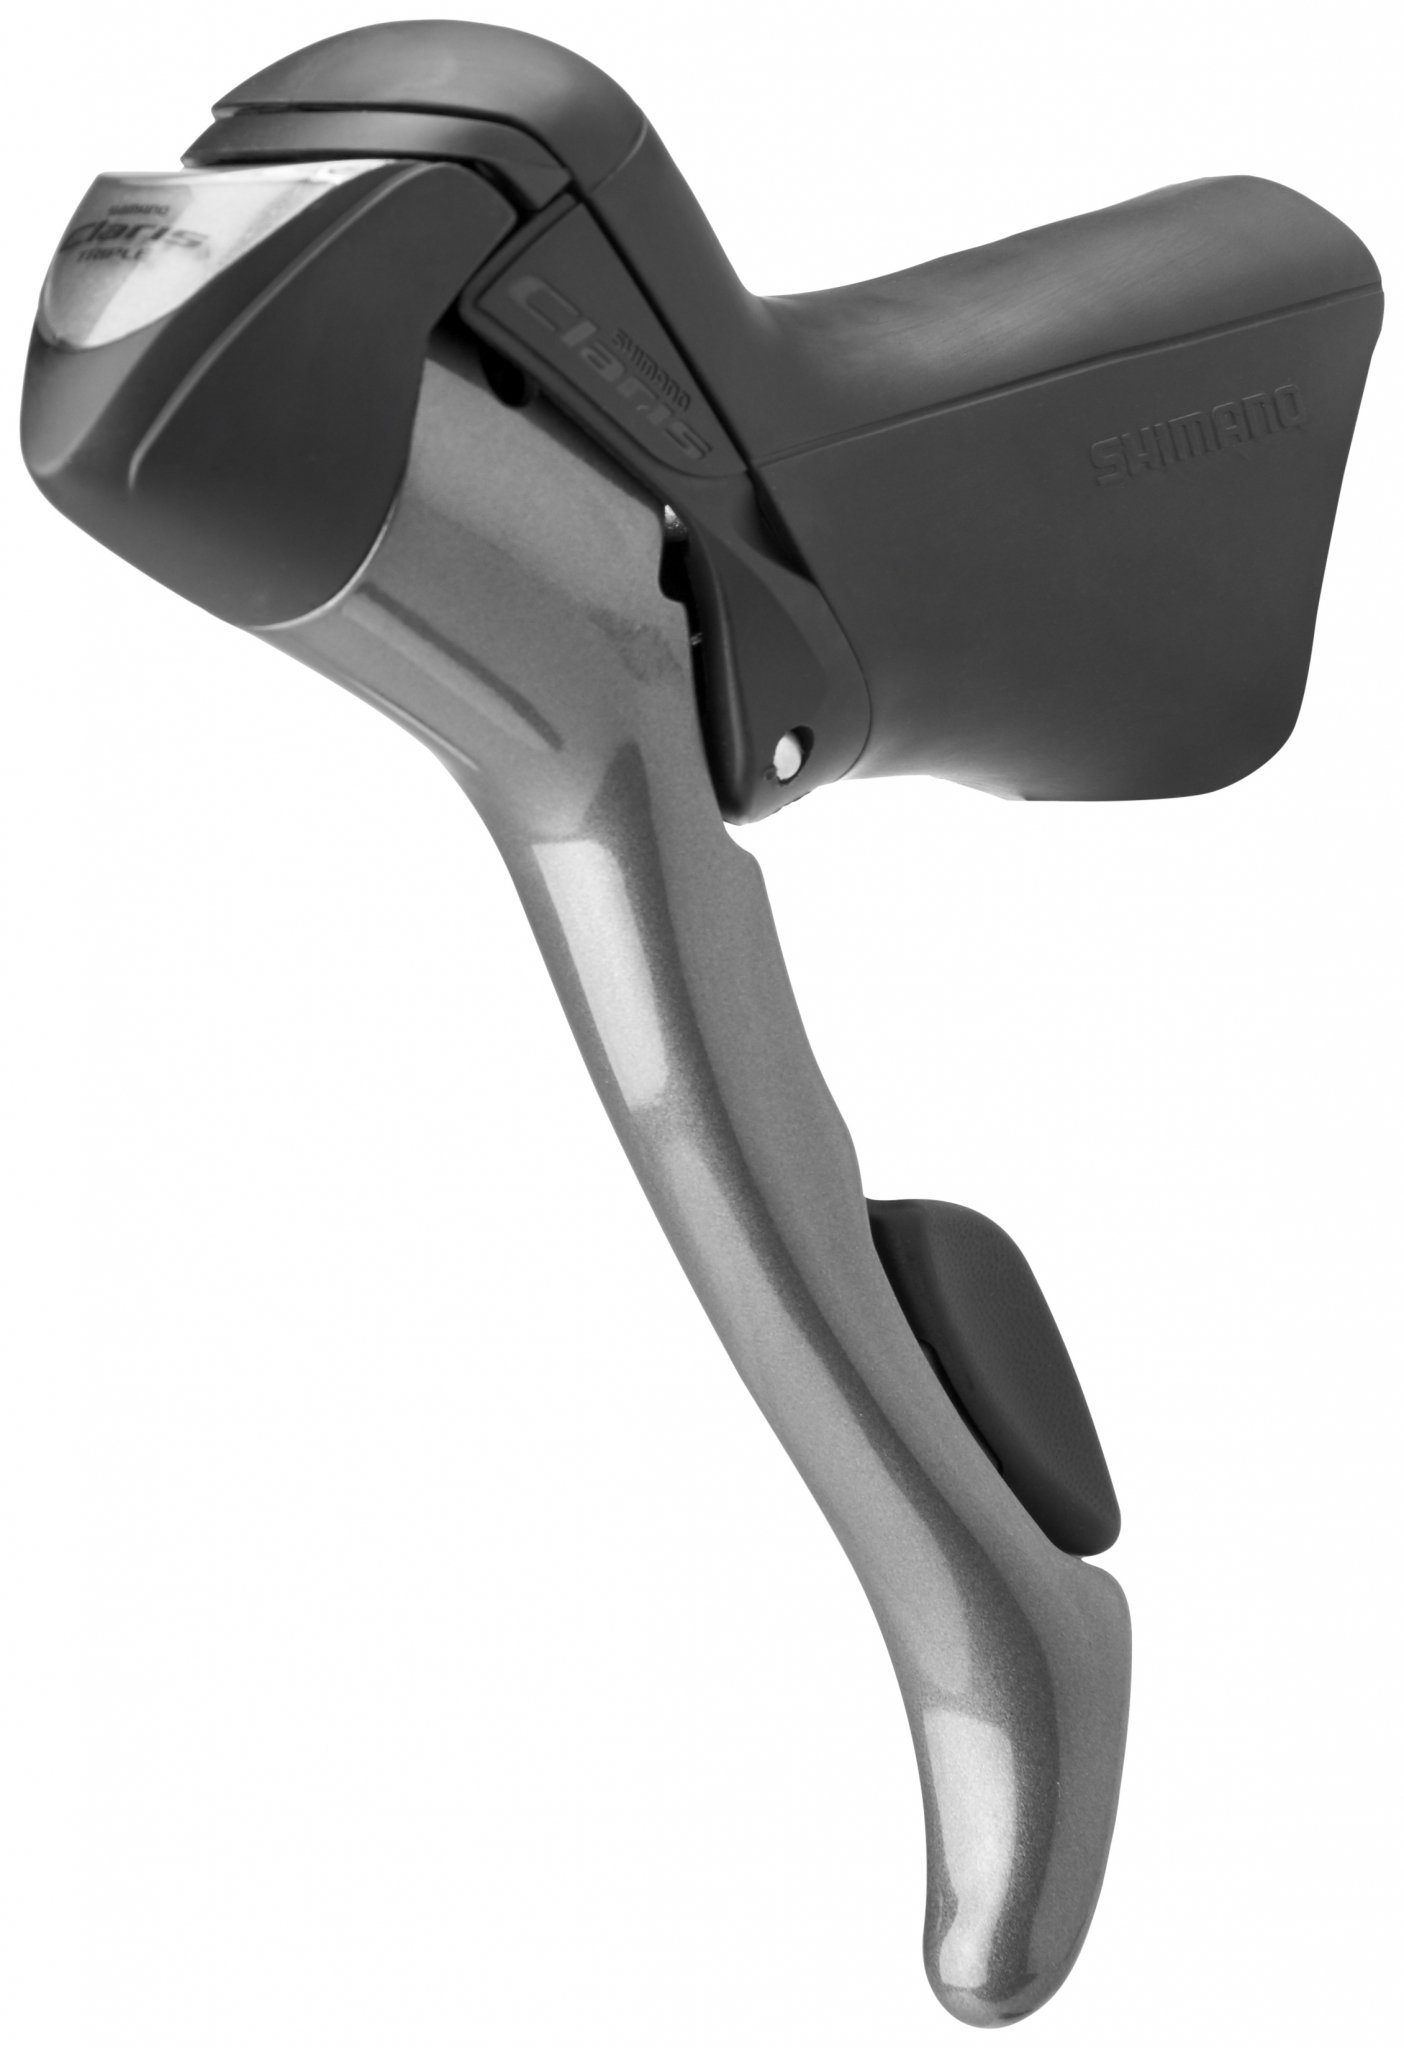 Shimano Schaltung »Claris ST-2400«